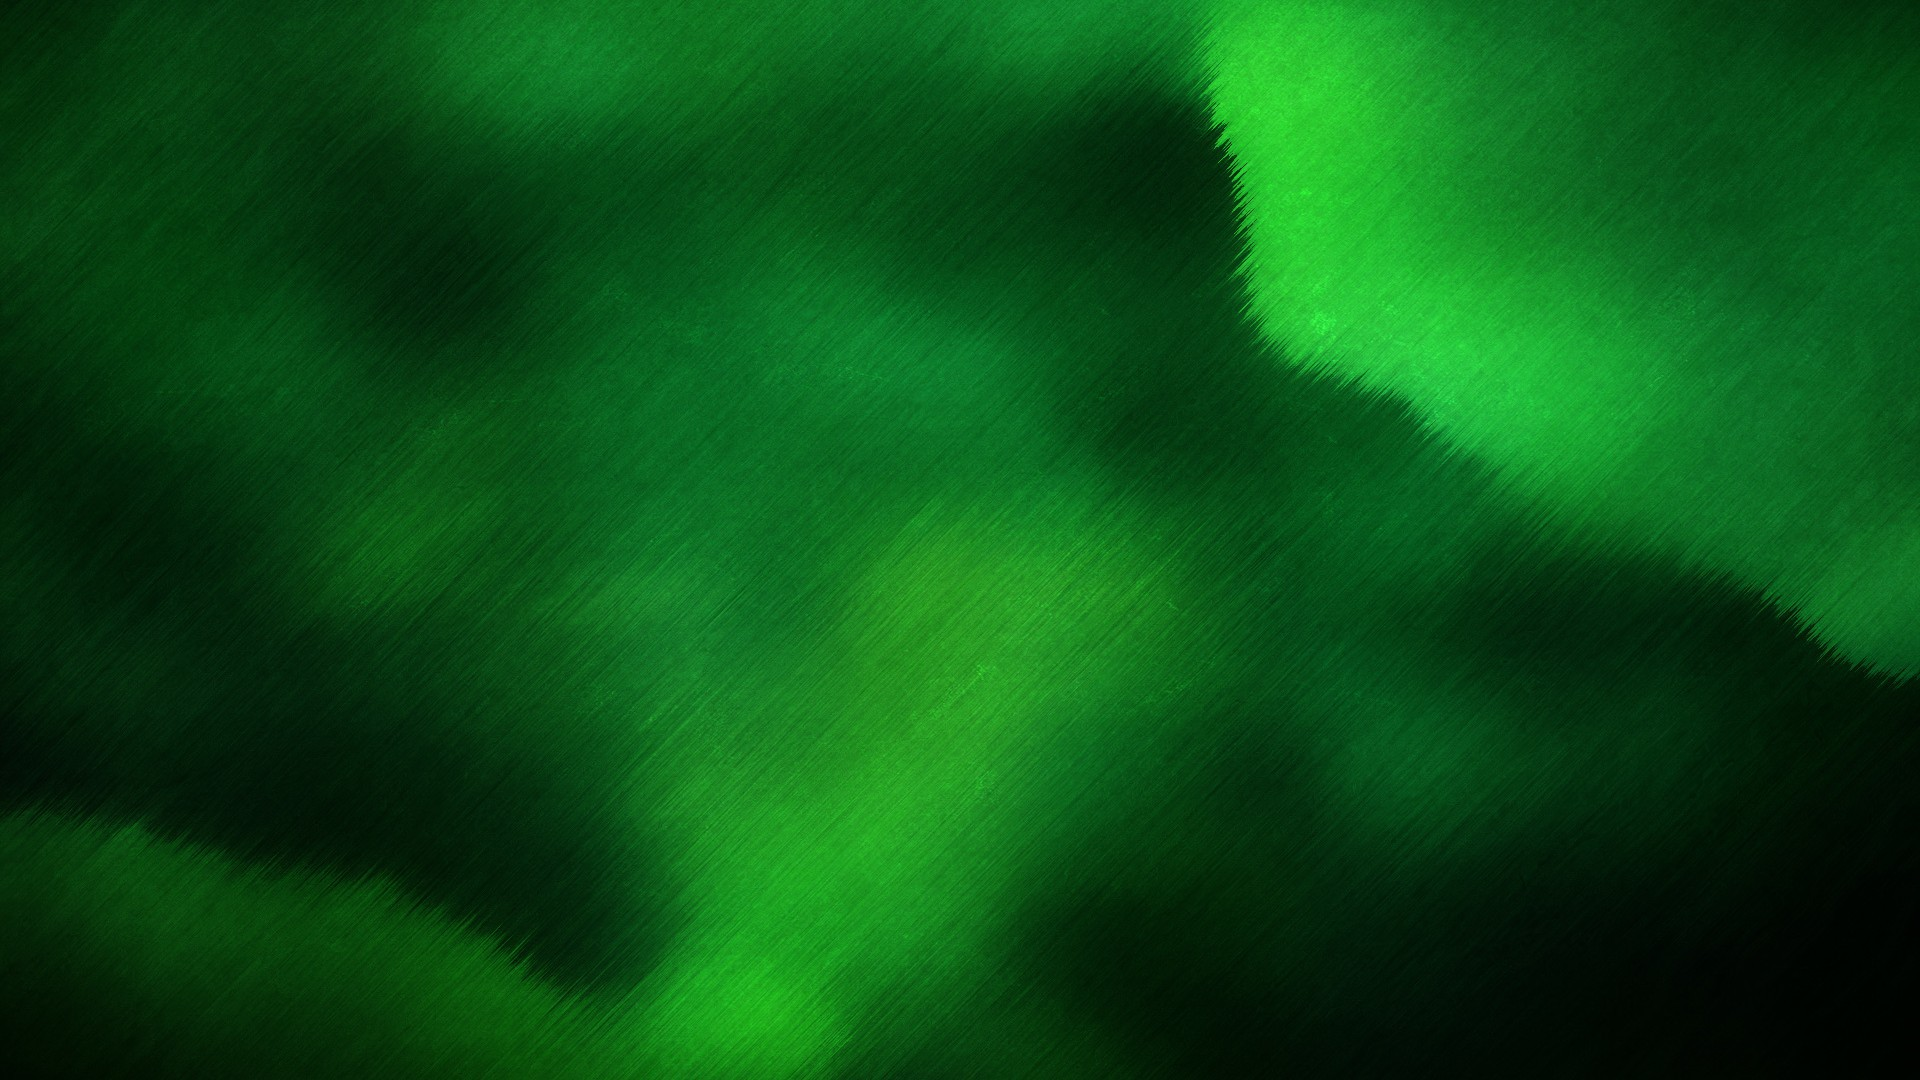 Green And Black Wallpaper 3 High Resolution Wallpaper